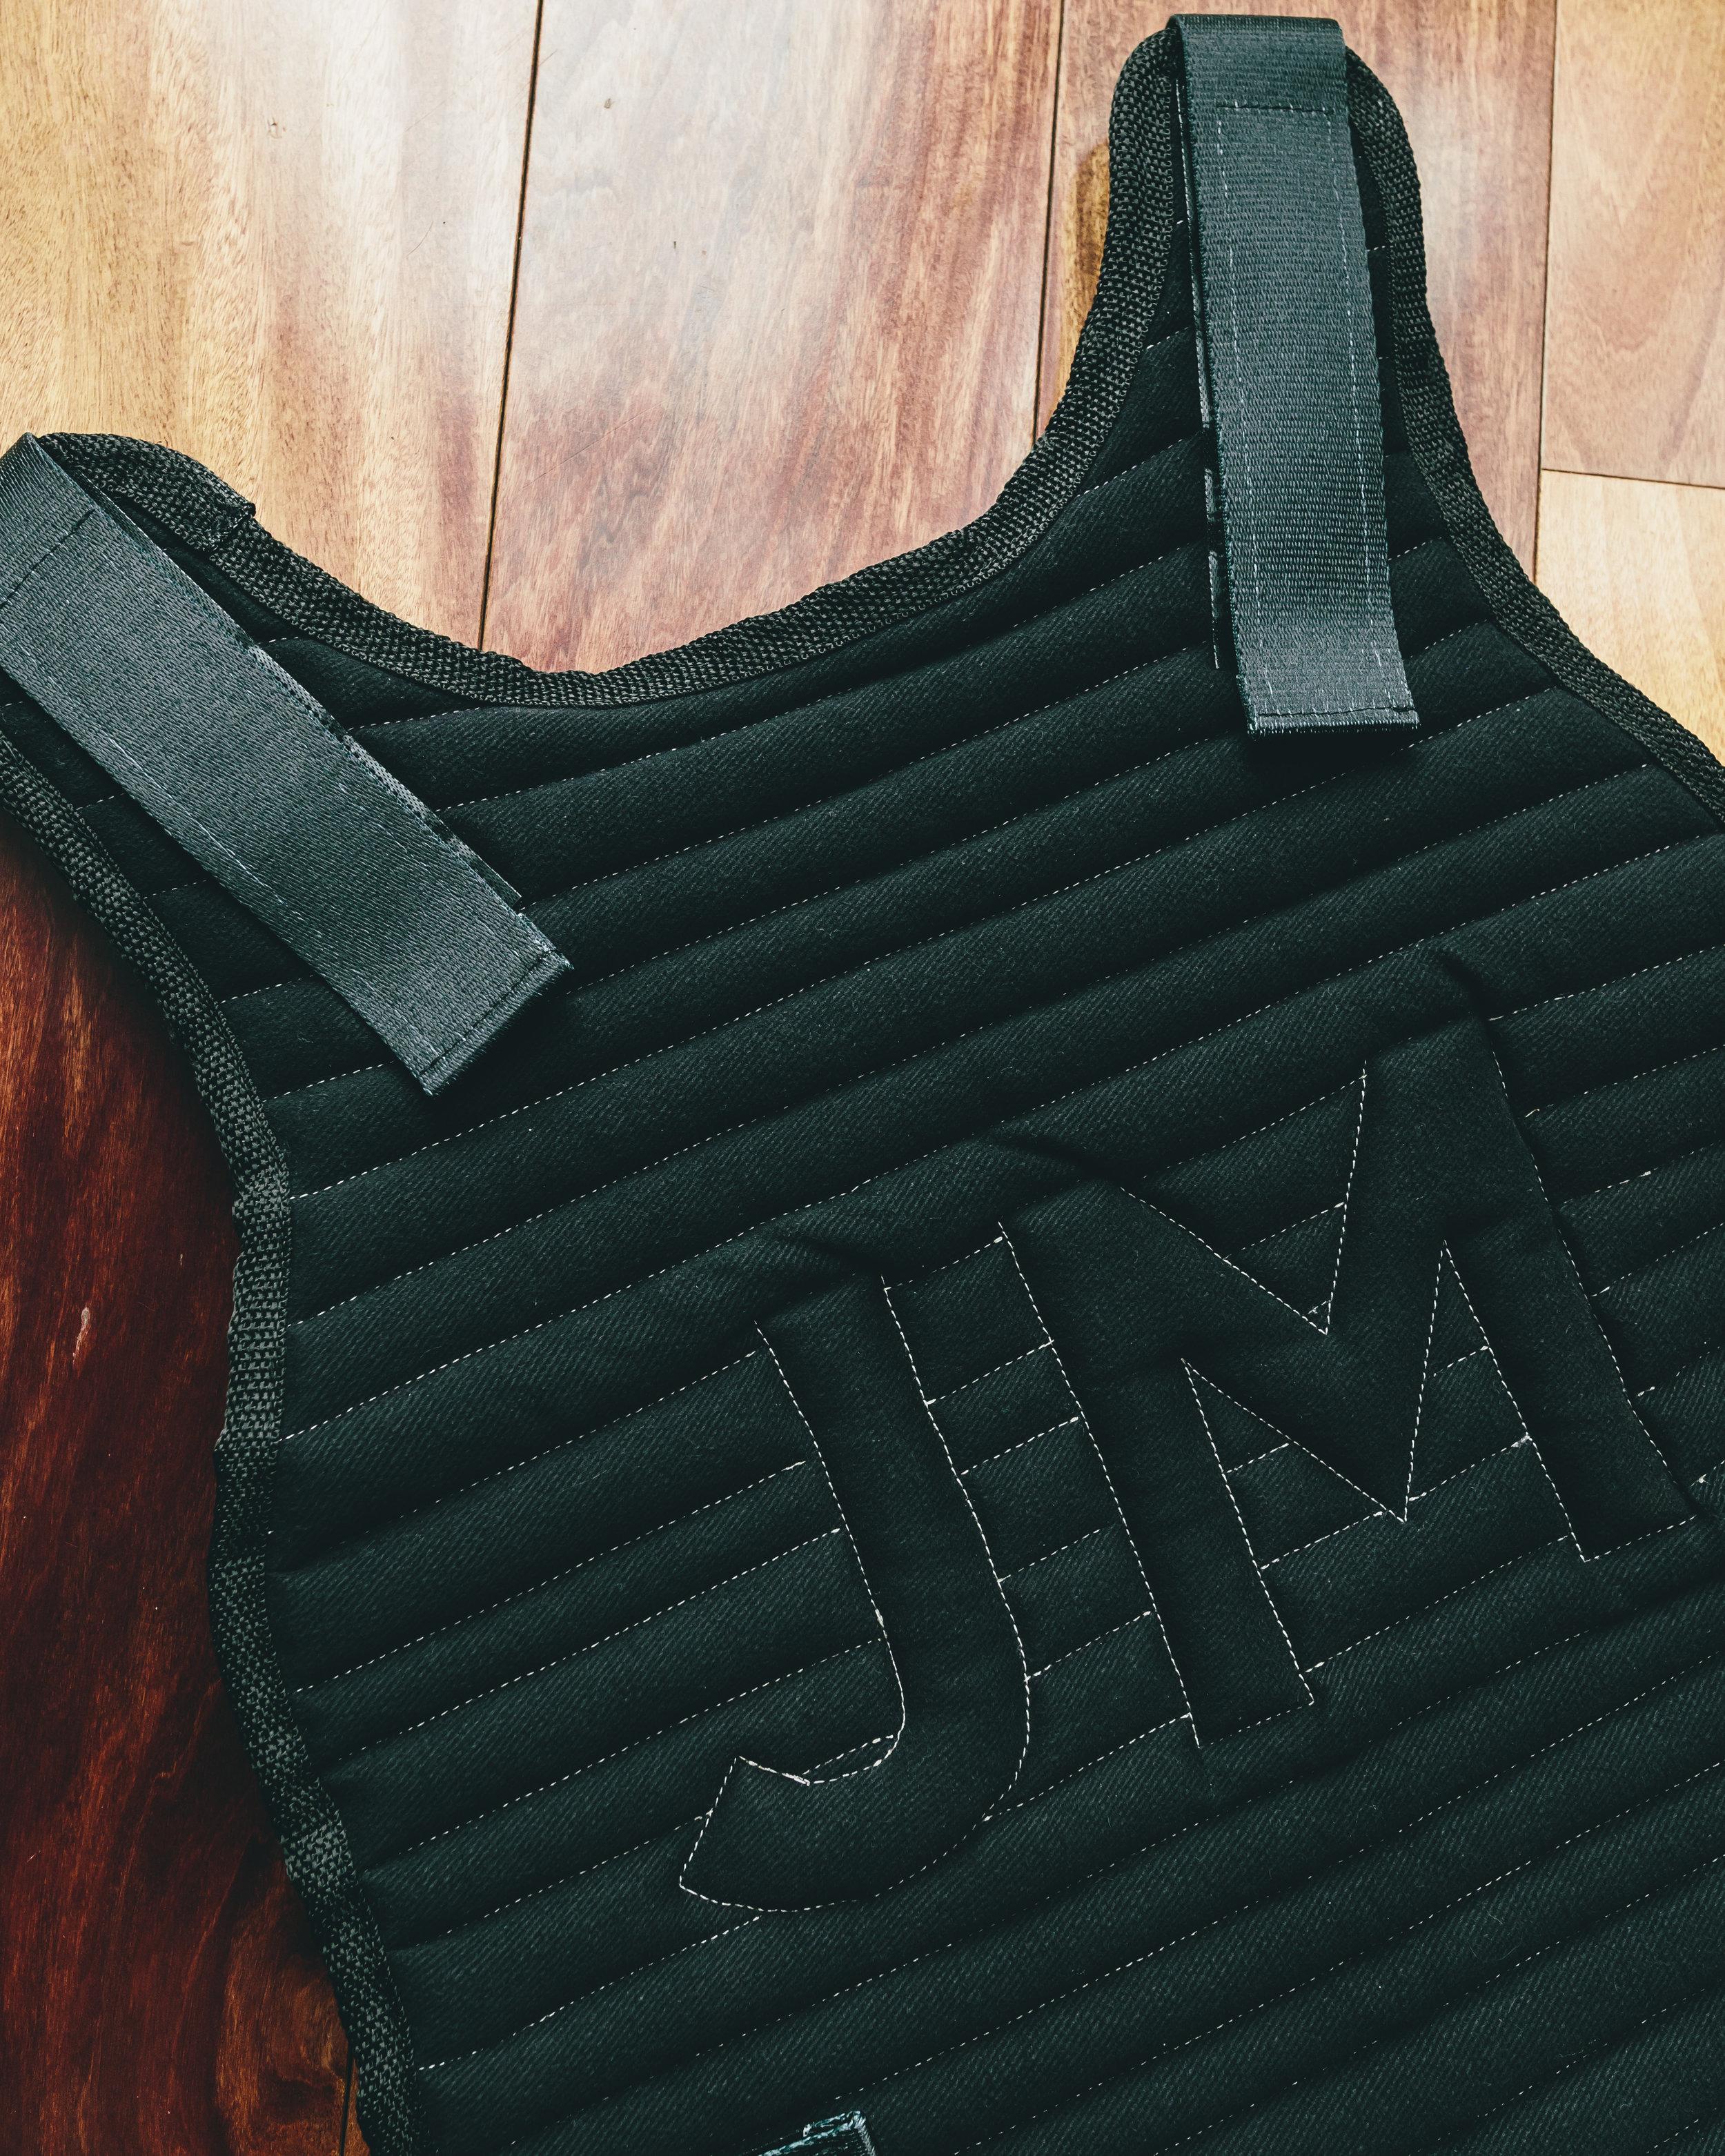 JMPRODUCT-562.jpg